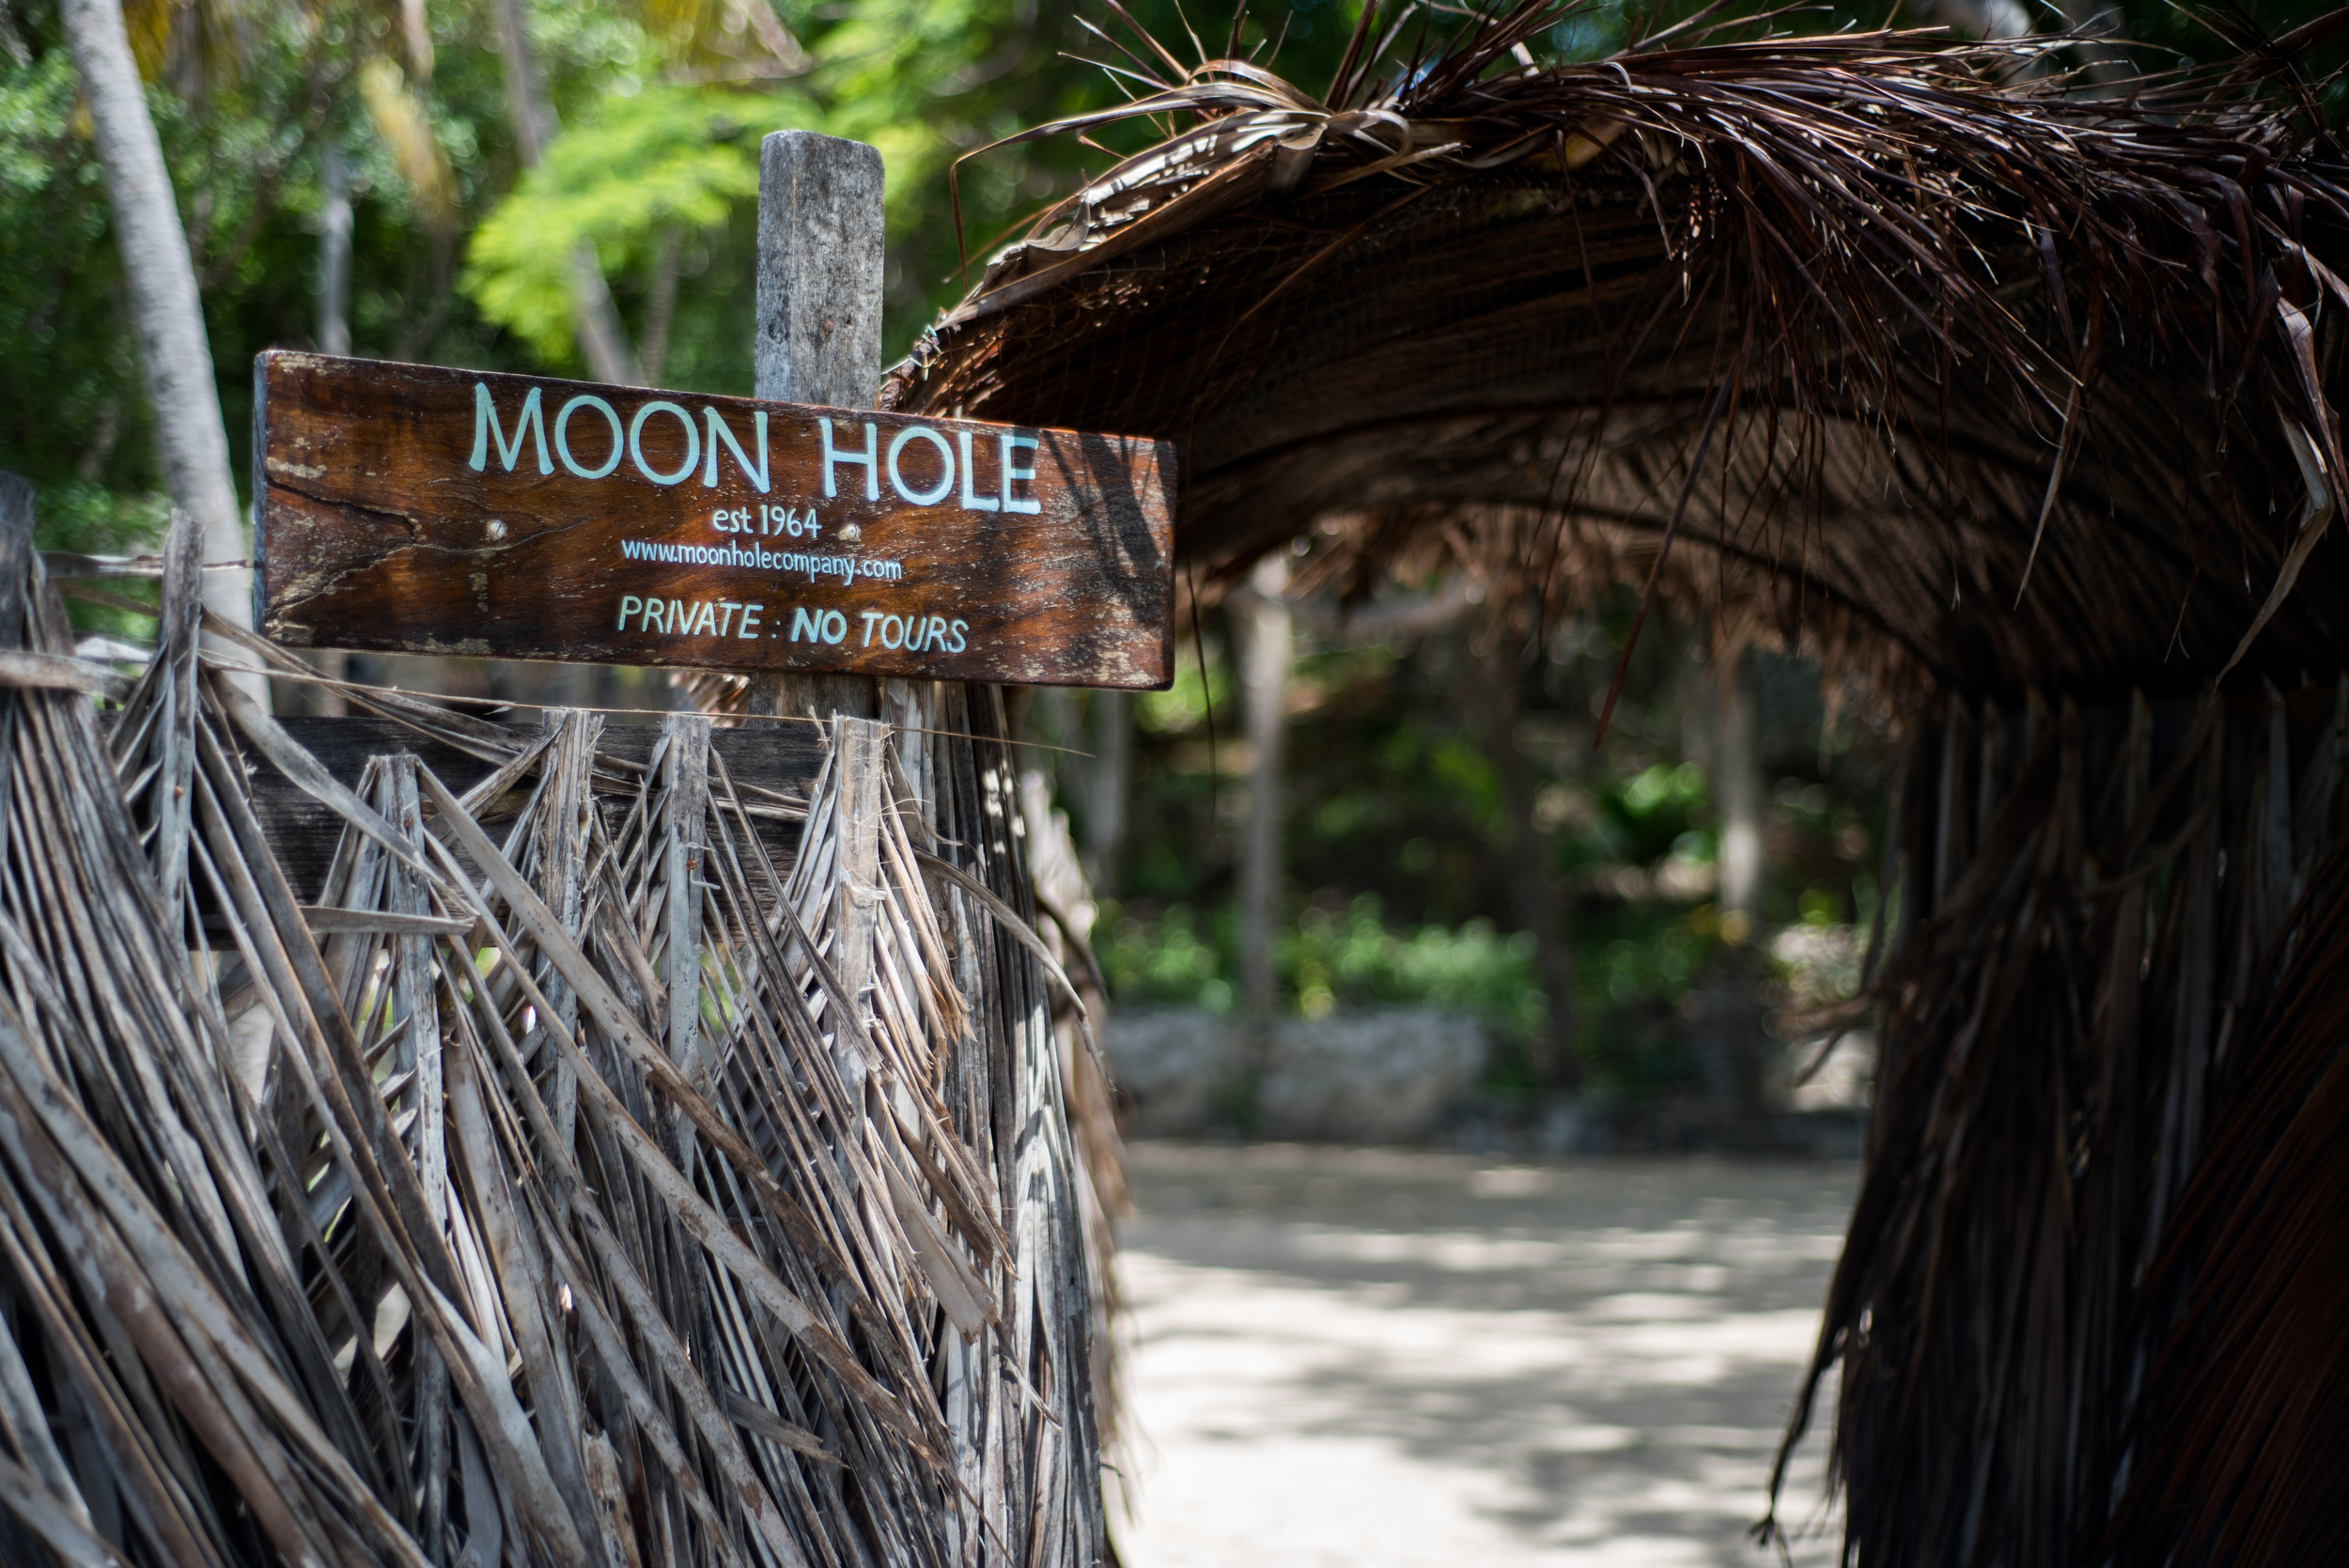 moonhole01.jpg